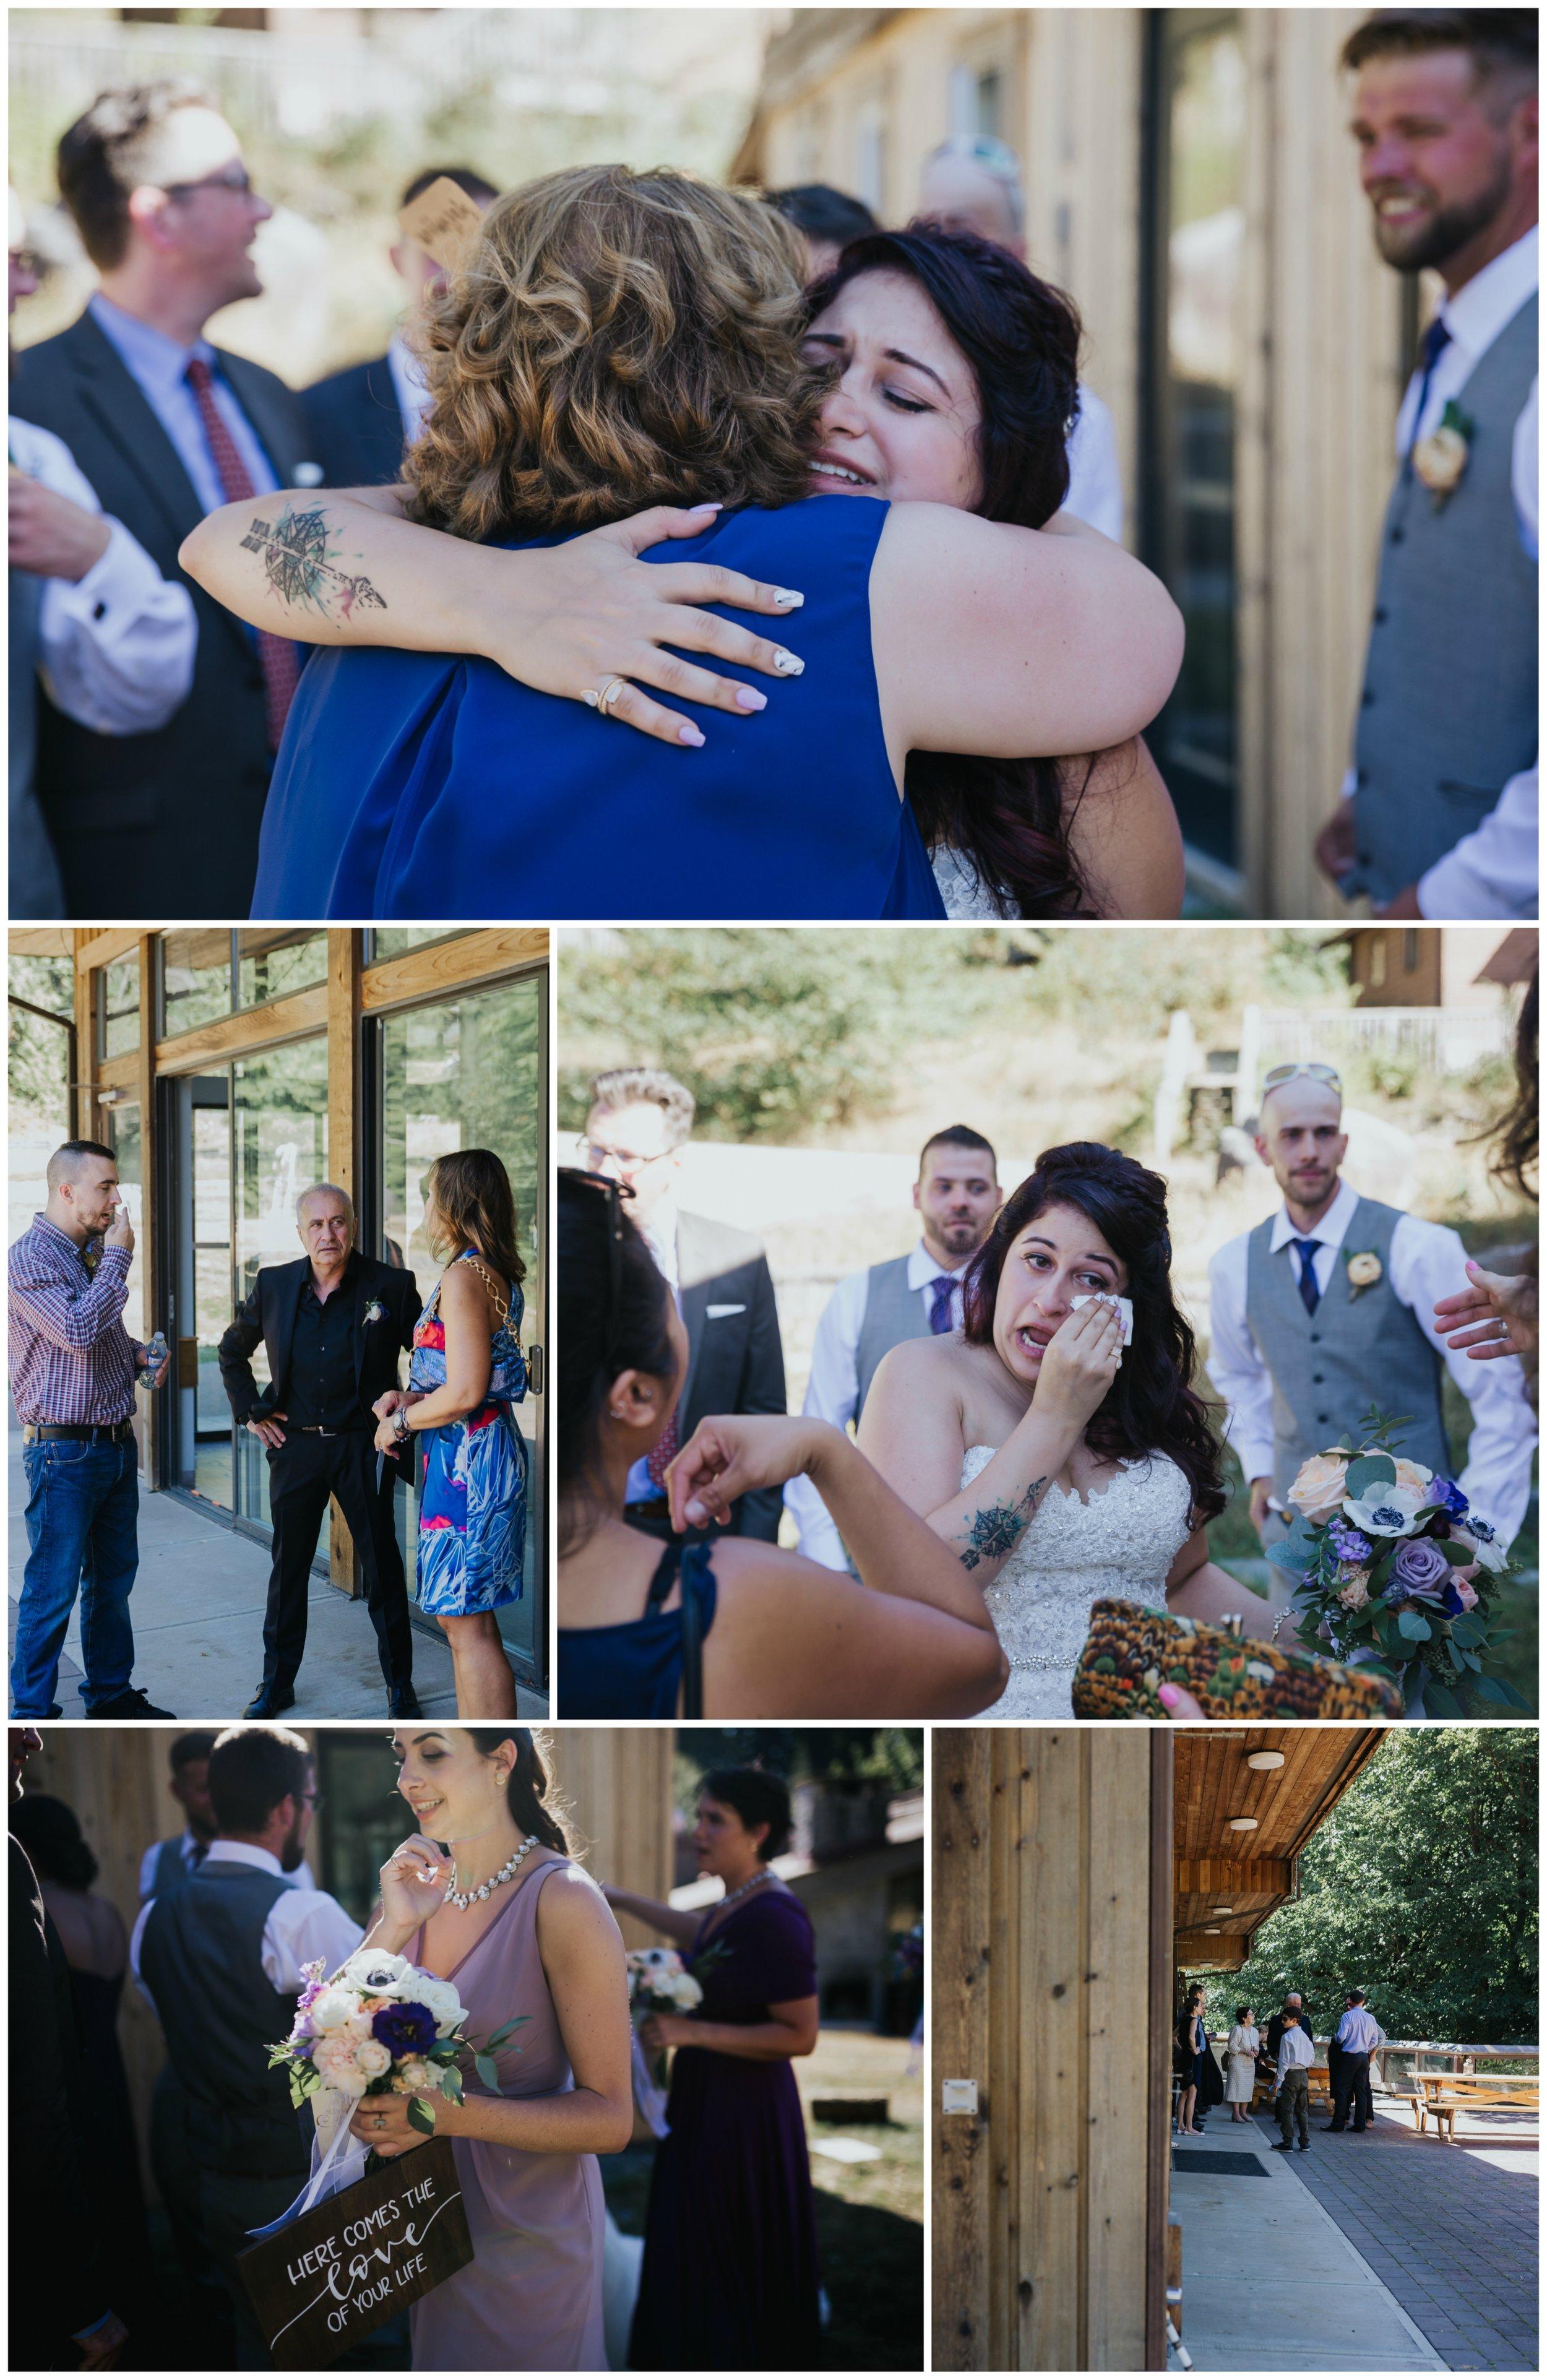 Camp Howdy Rustic Cabin Wedding receiving line.jpg